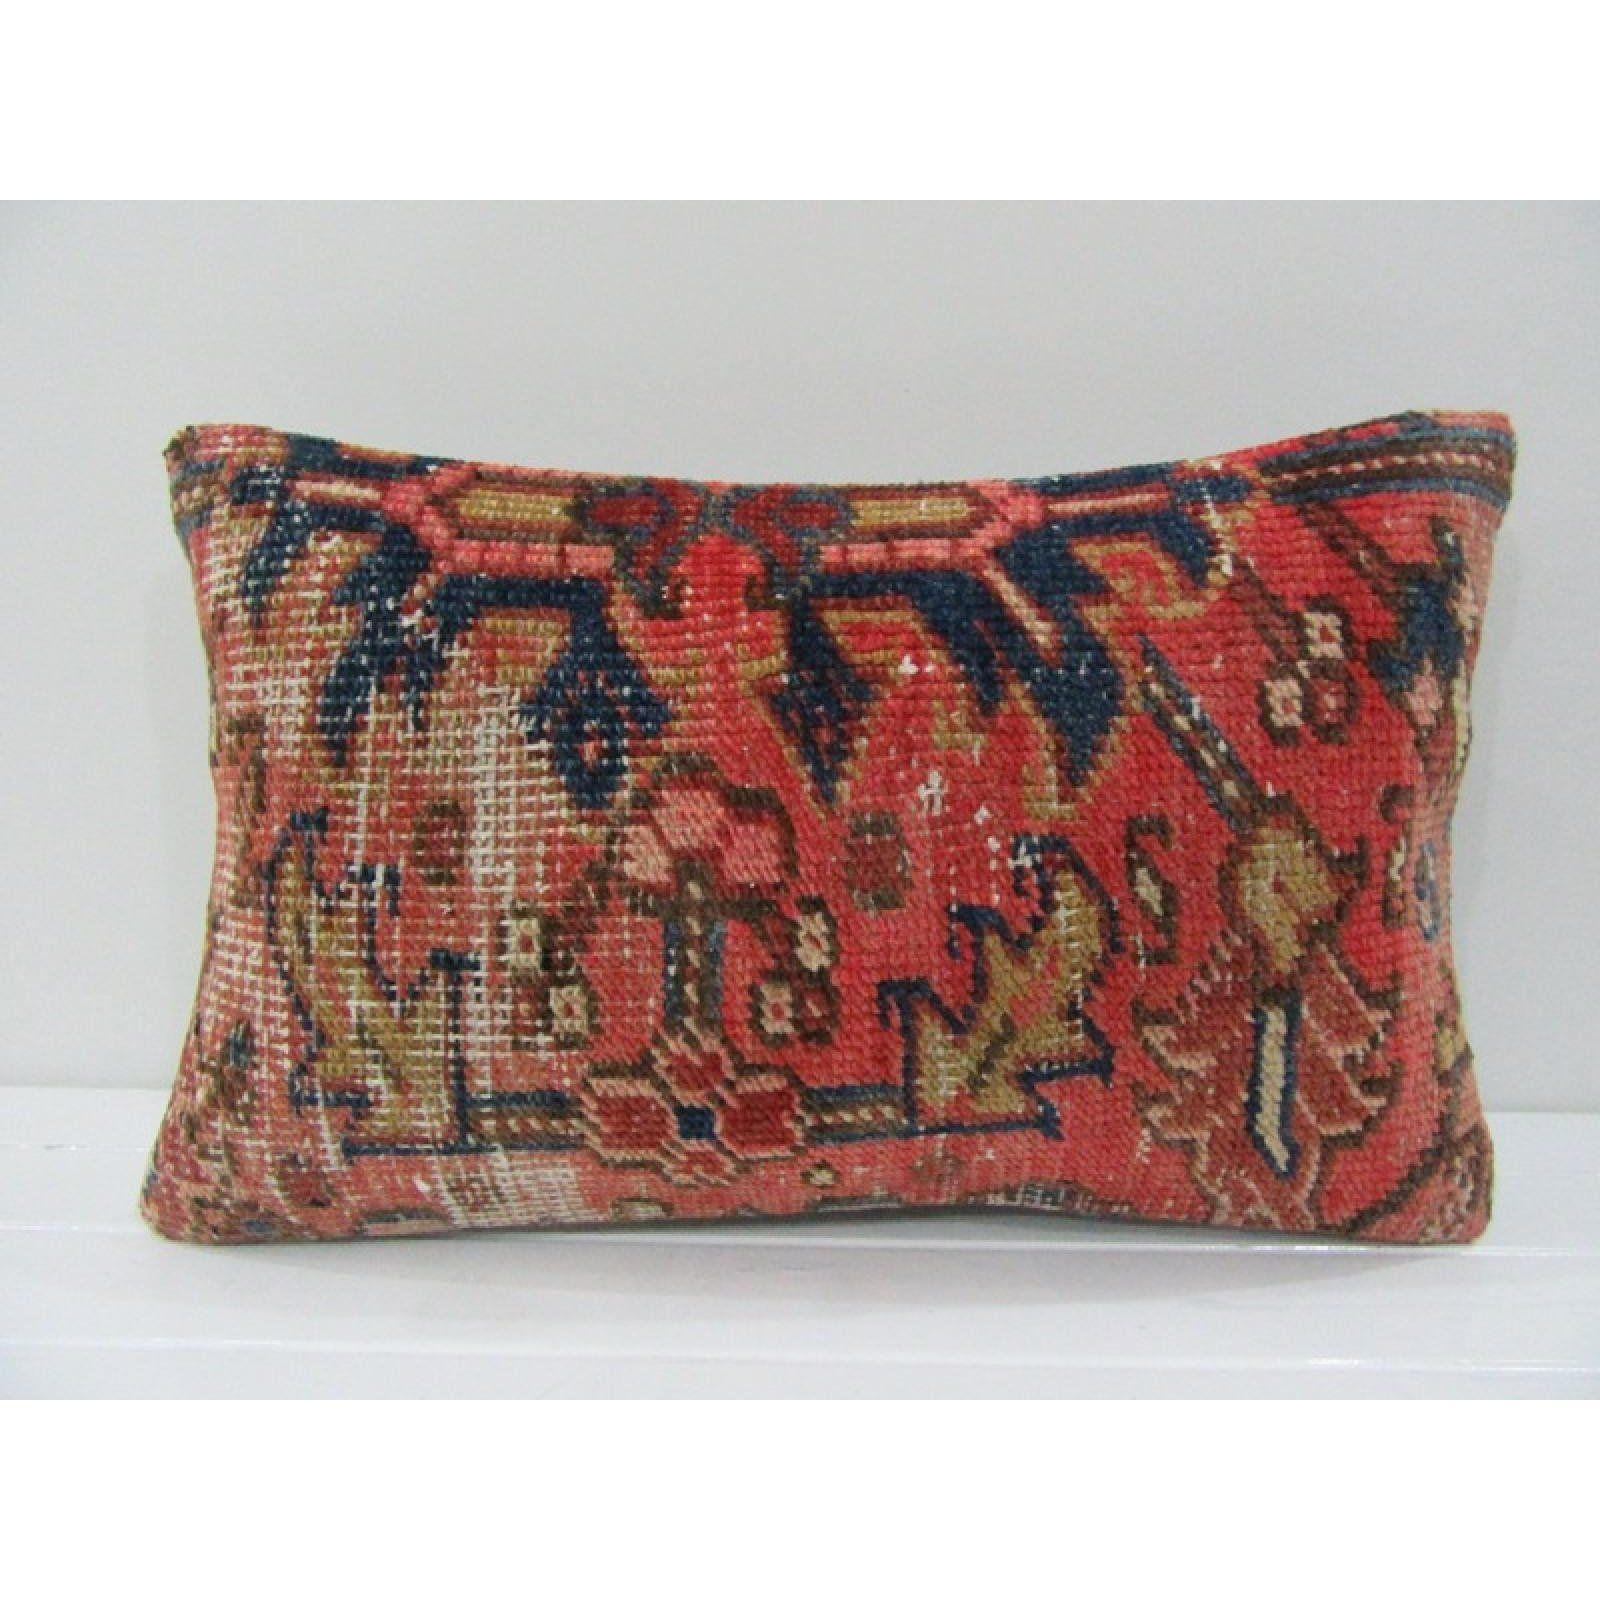 kilim pillow handmade lumbar pillow vintage pillow home living home decor design pillow wool pillow furniture pillow comfortable pillow